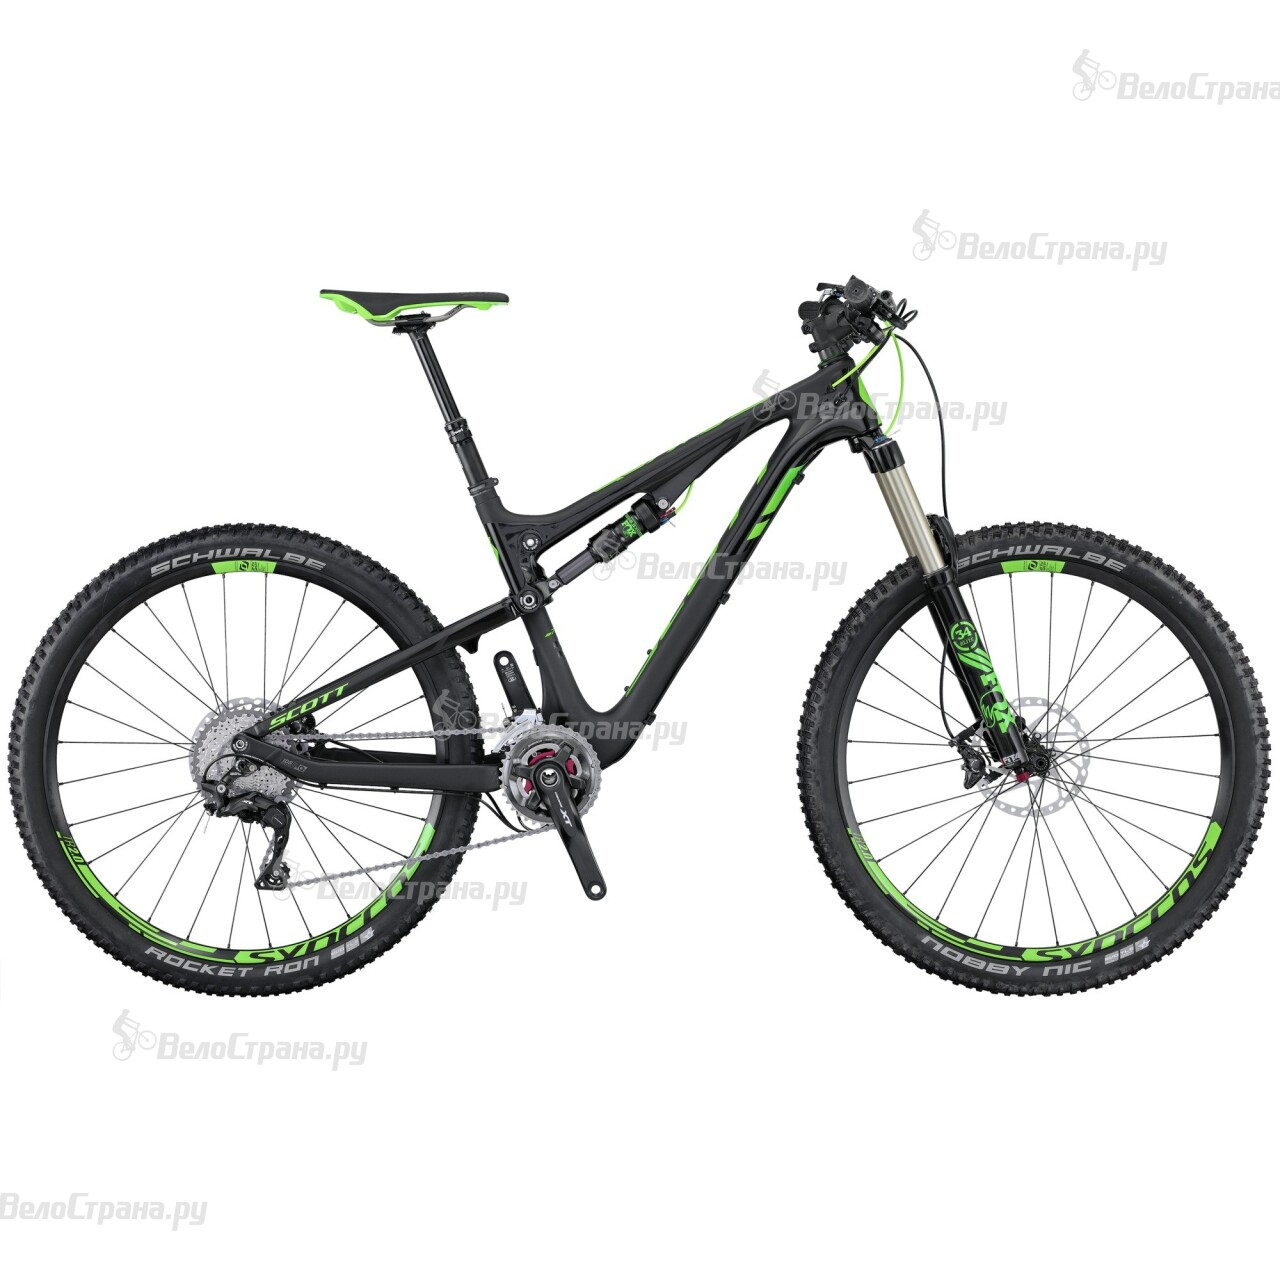 Велосипед Scott Genius 910 (2016)